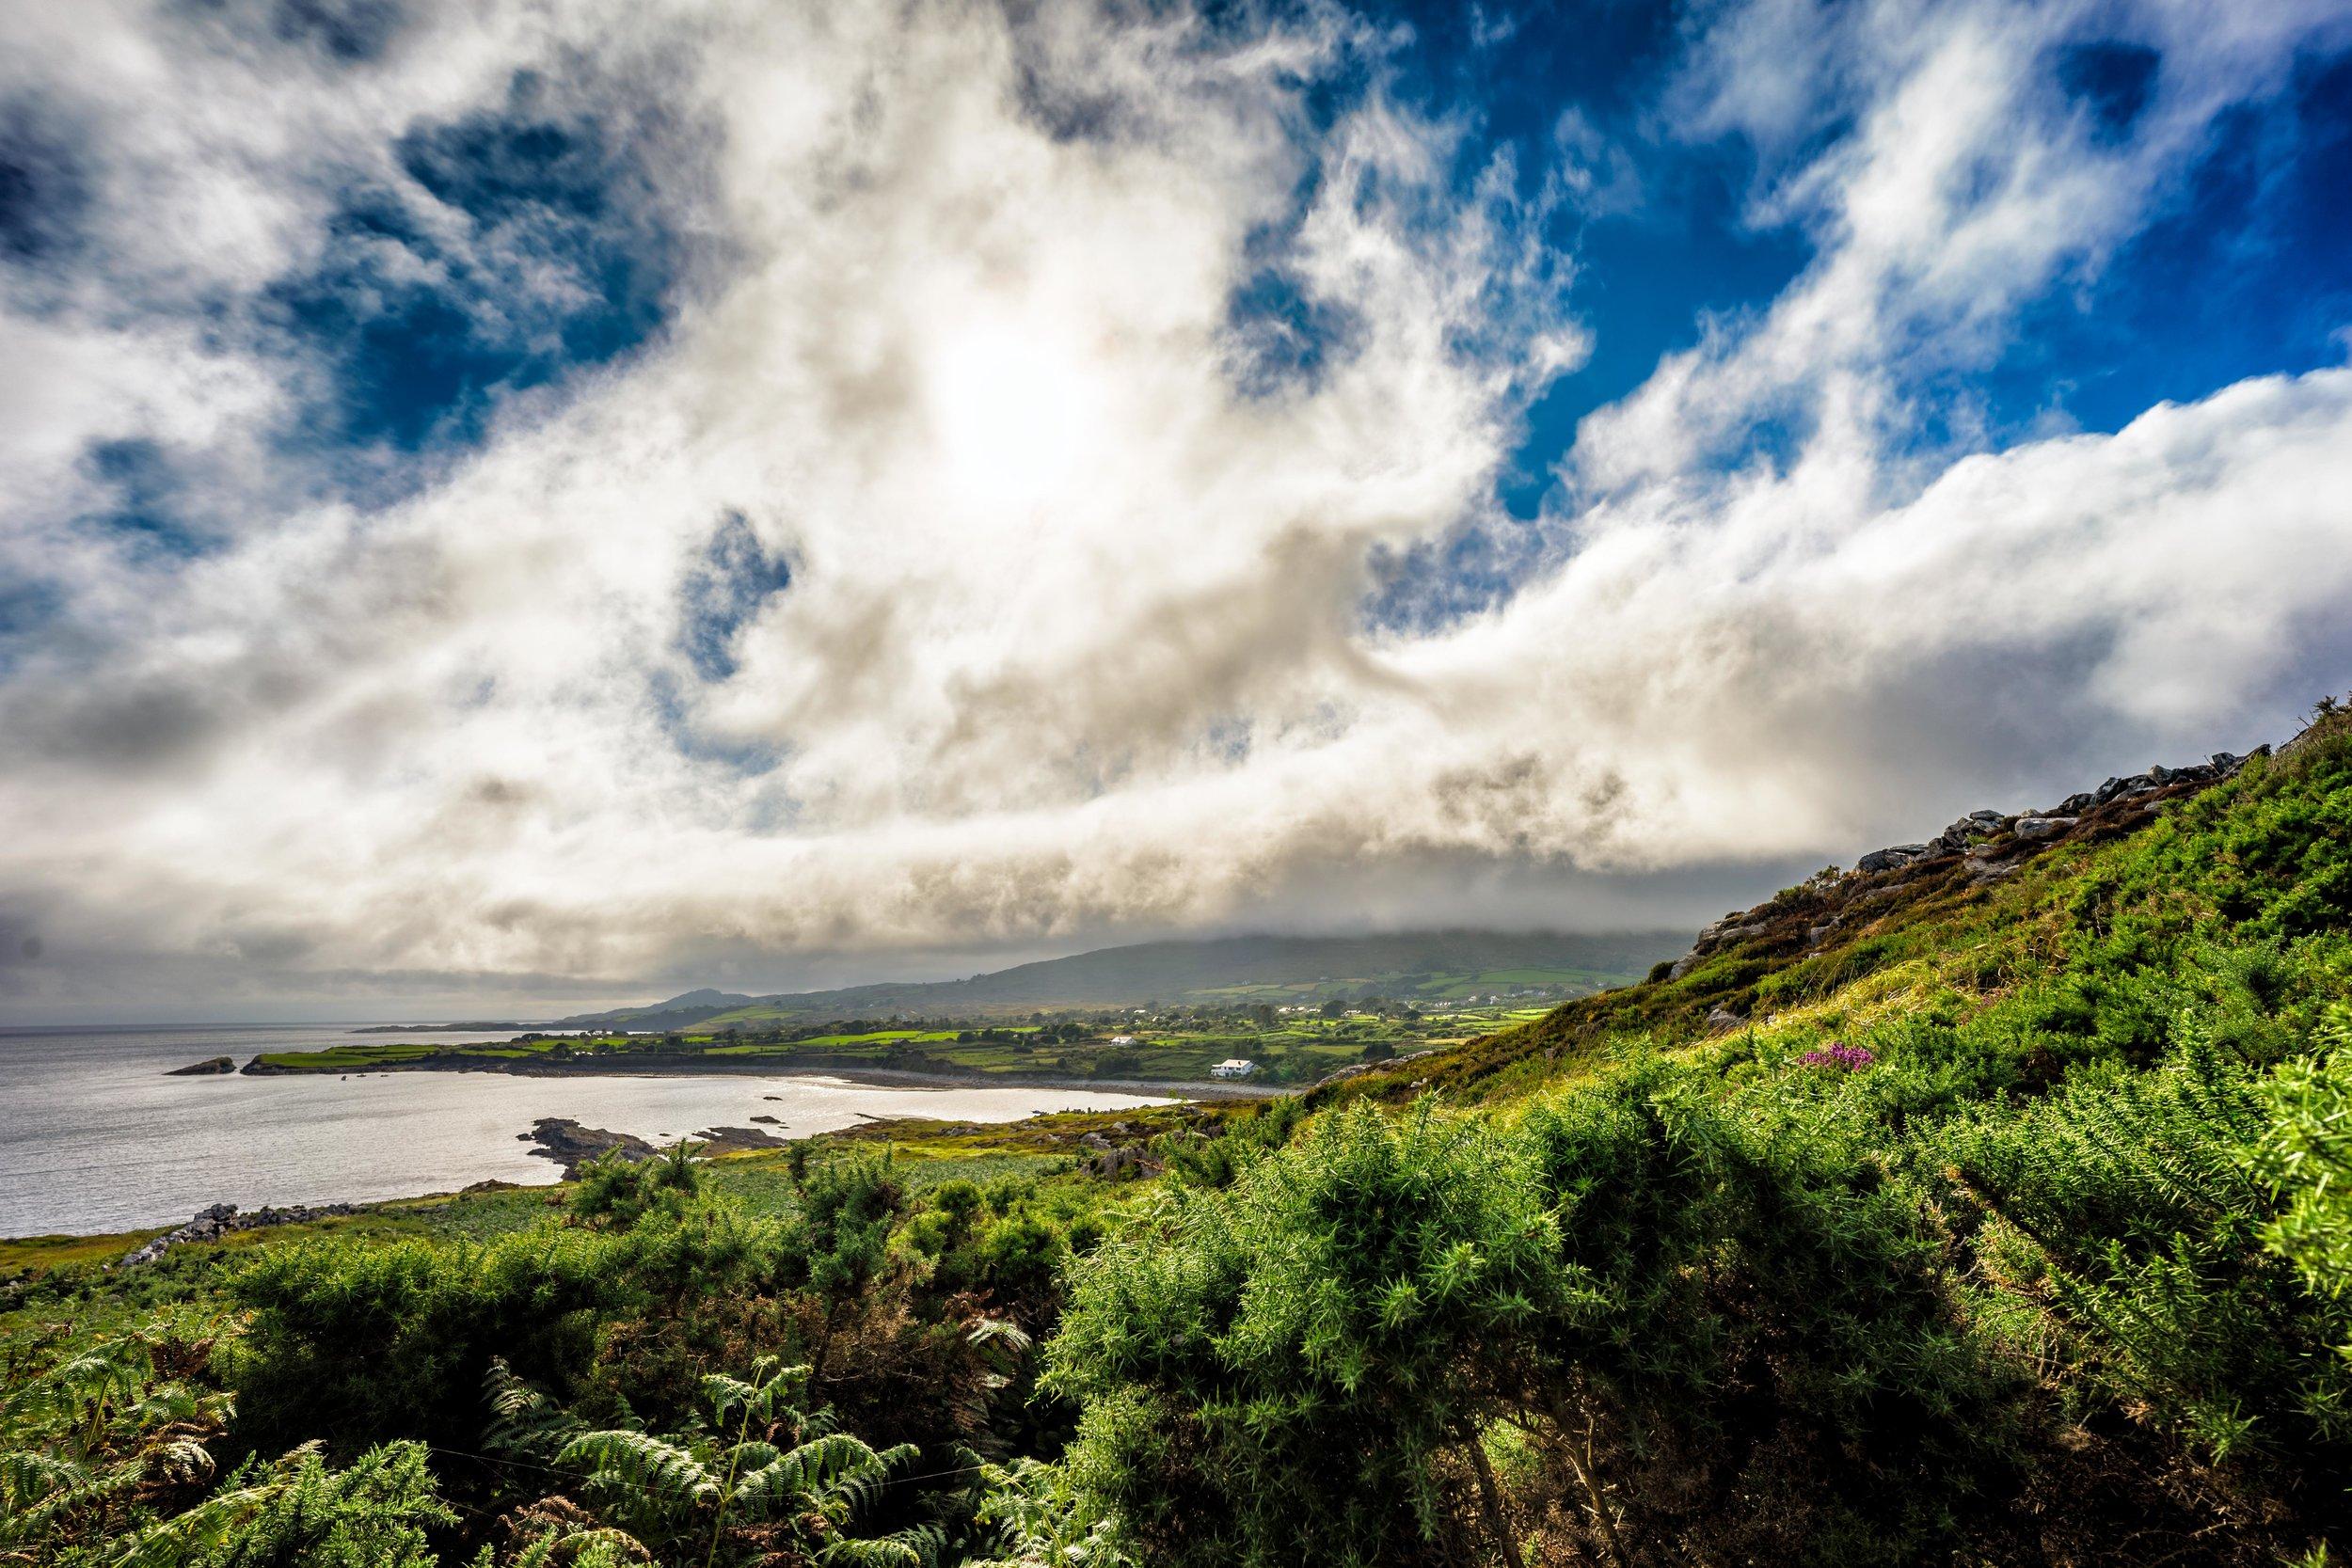 county cork. cork. ireland. irish. history. city. house sitting. old. travel. travel photography. travel photographer. lough hyne. hiking. outdoor. adventure. hiking. camping. bright day..jpg